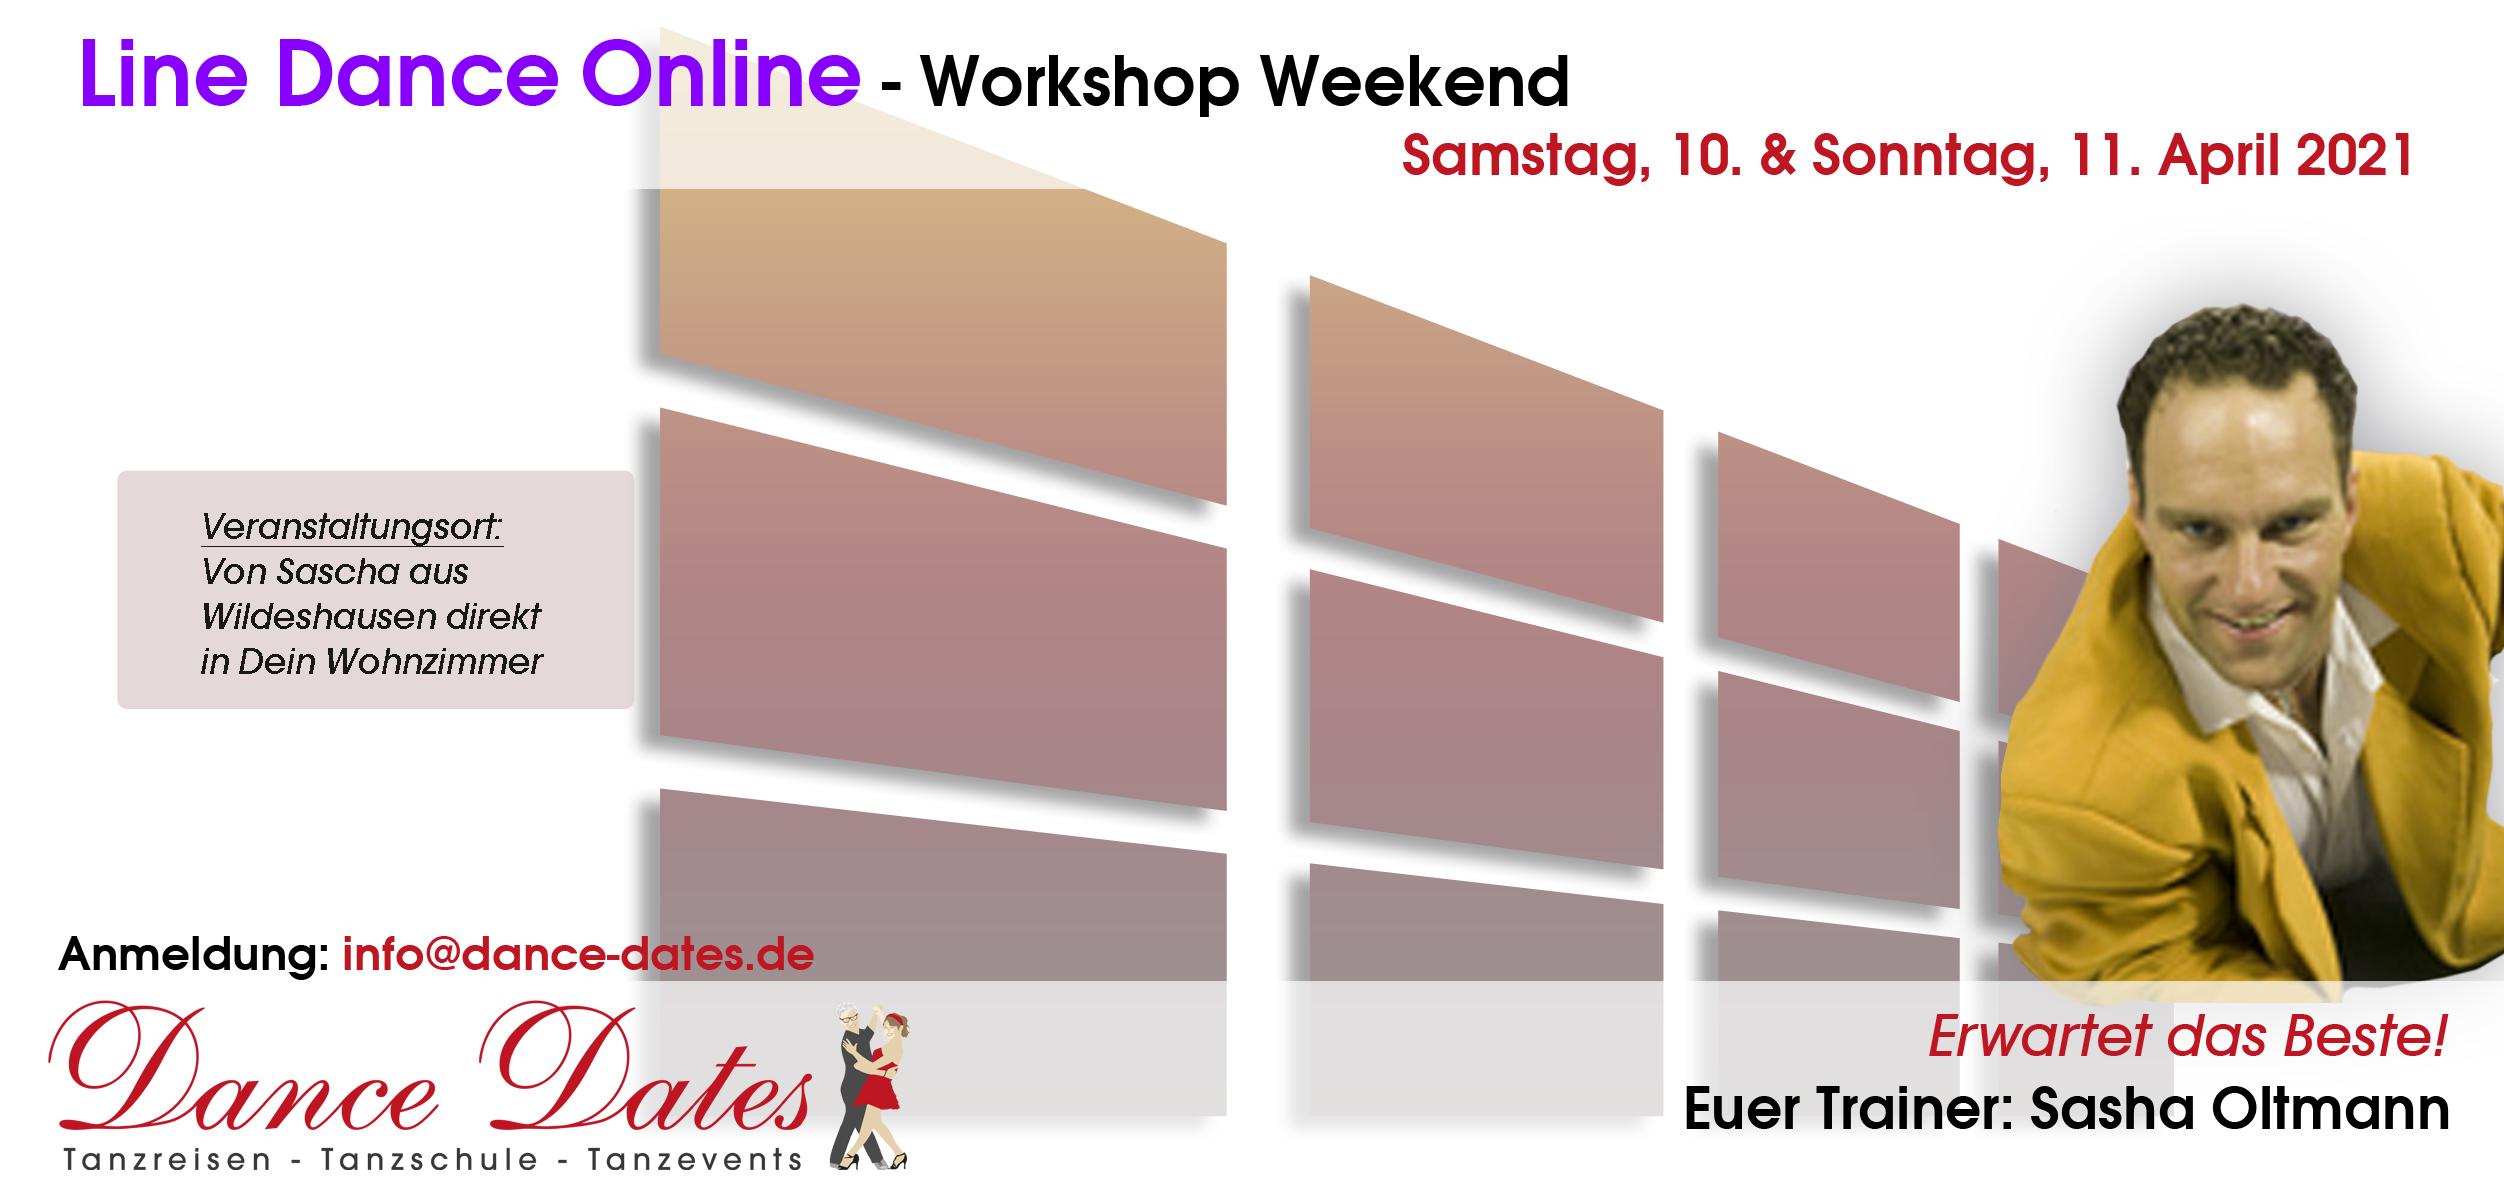 LineDance Online Workshop Weekend